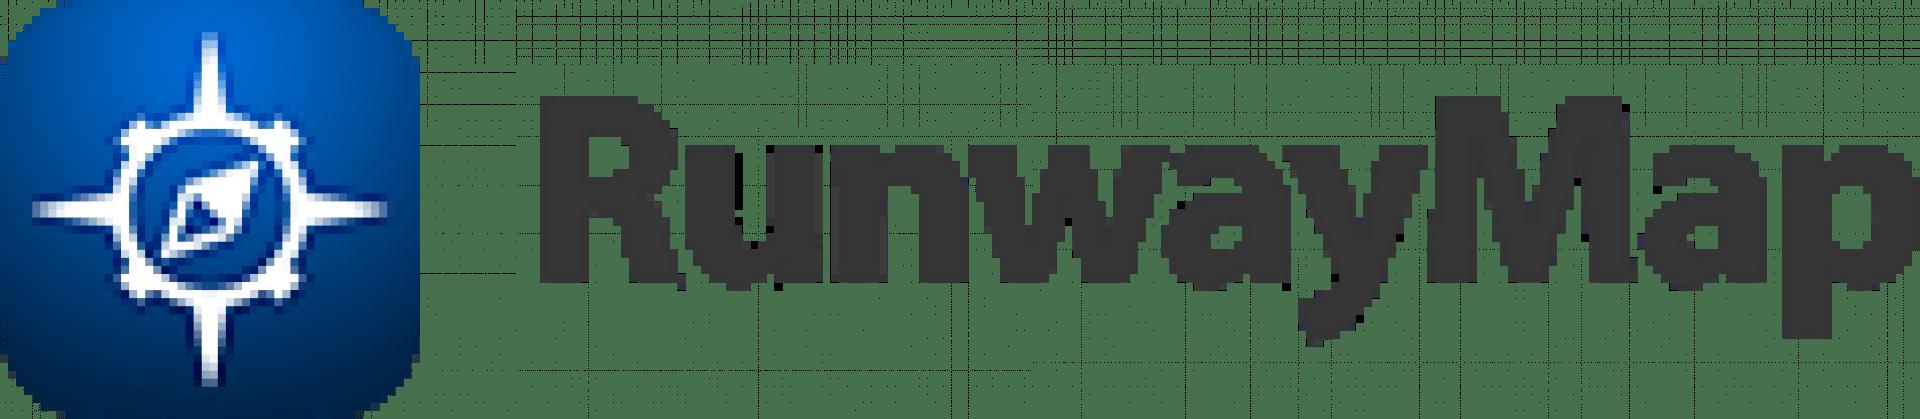 RunwayMap